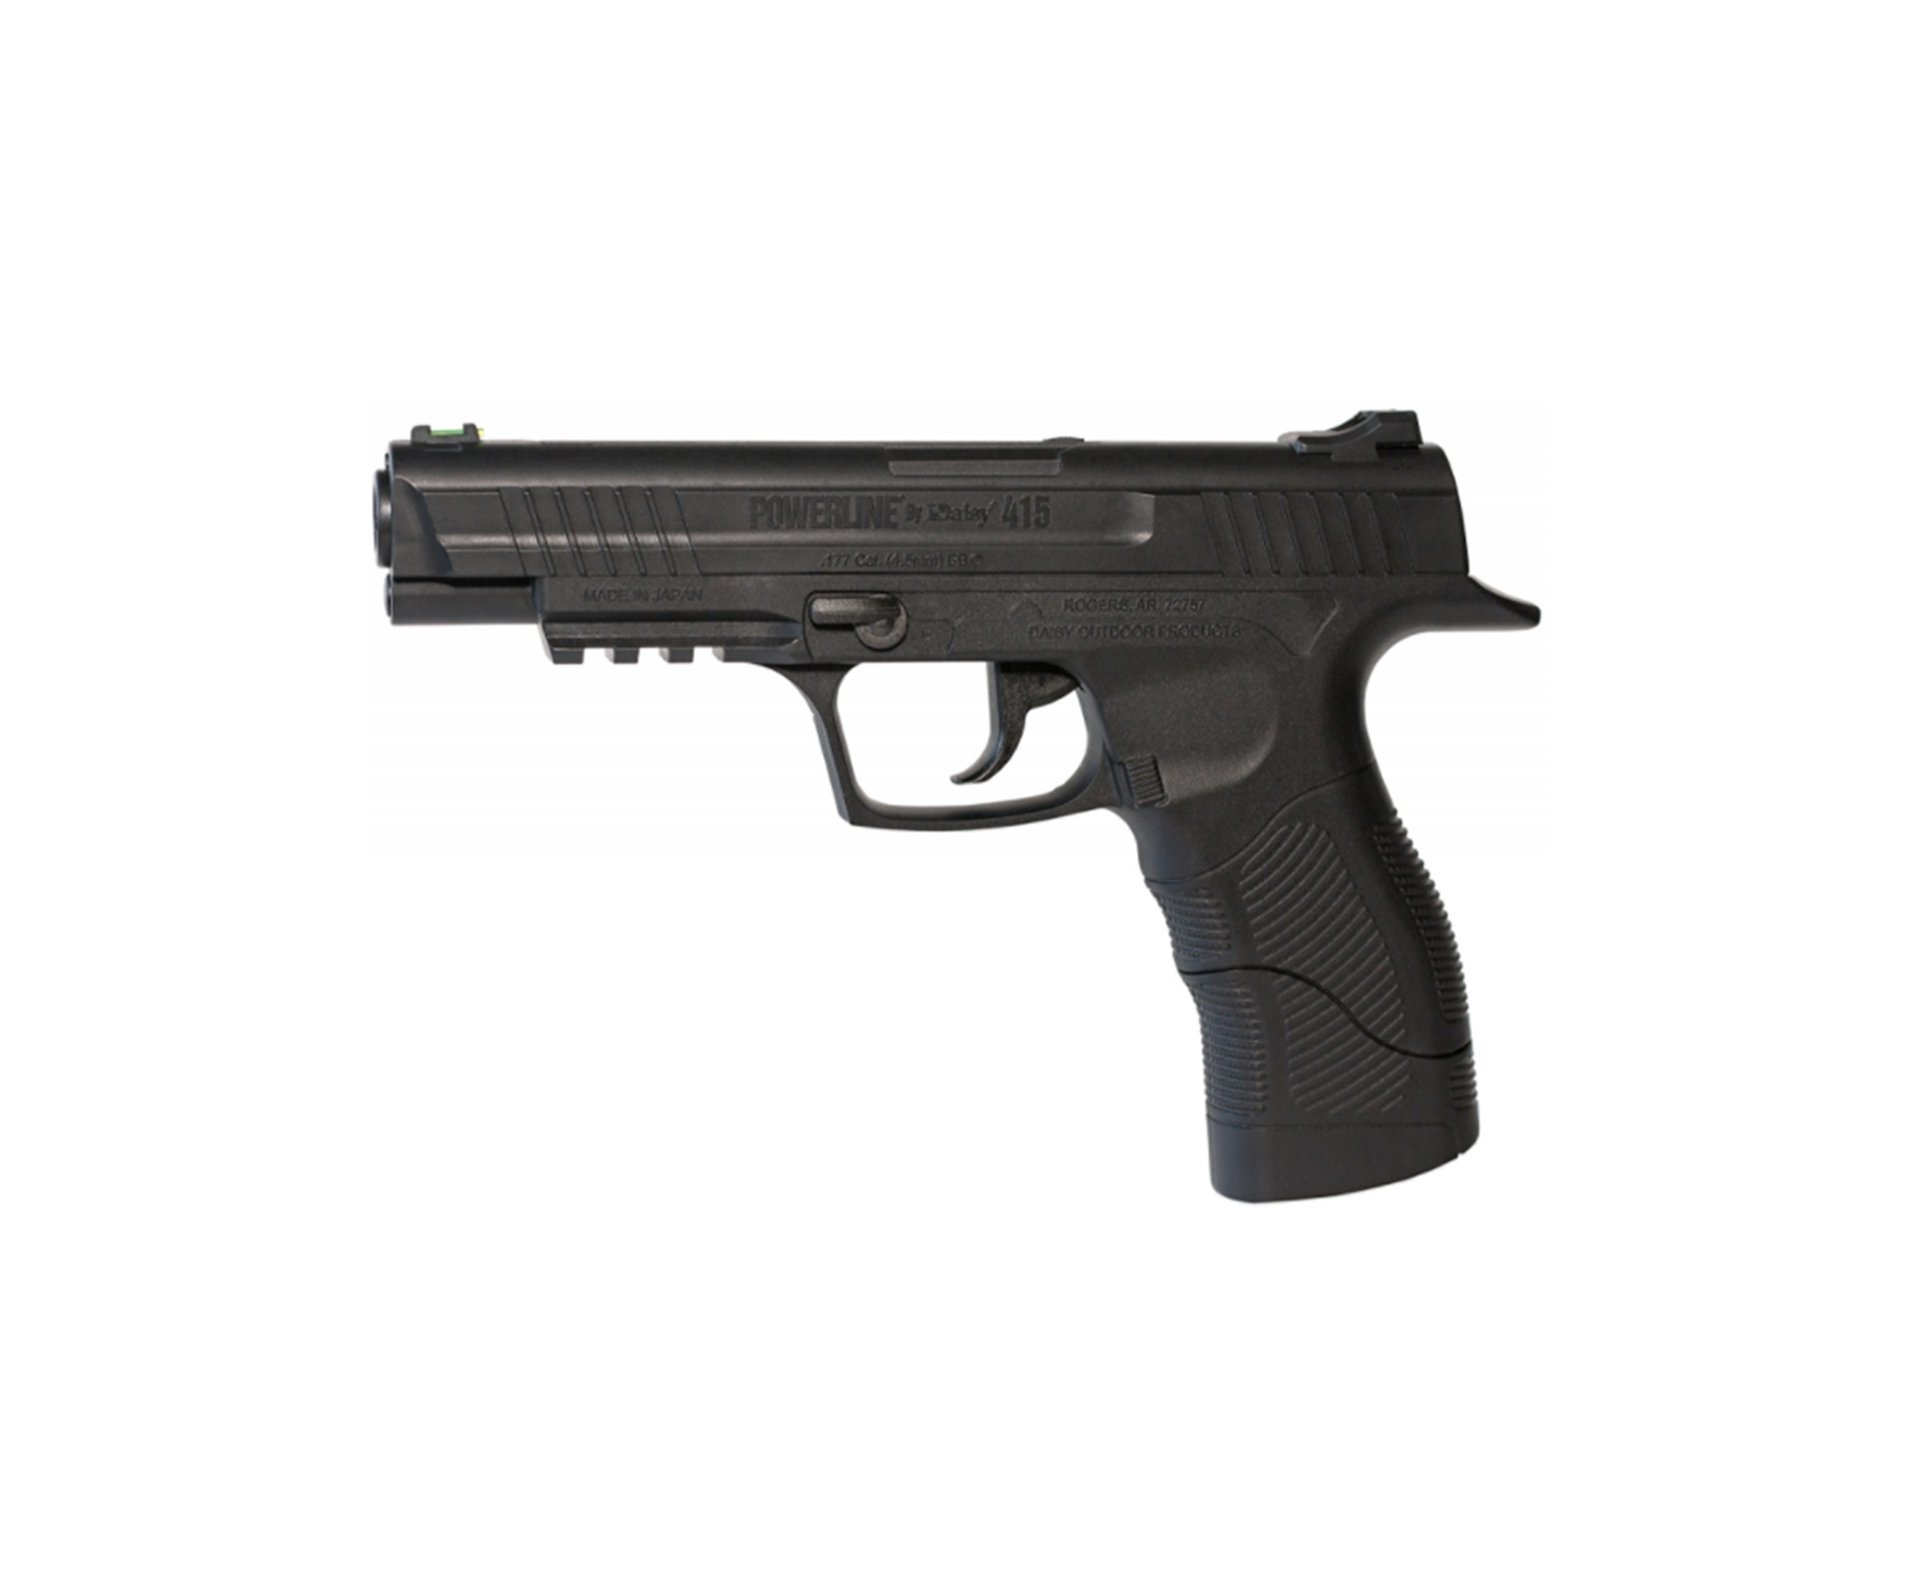 Pistola De Pressão Gas Co2 Semi-automática Daisy 415 Powerline 4.5mm